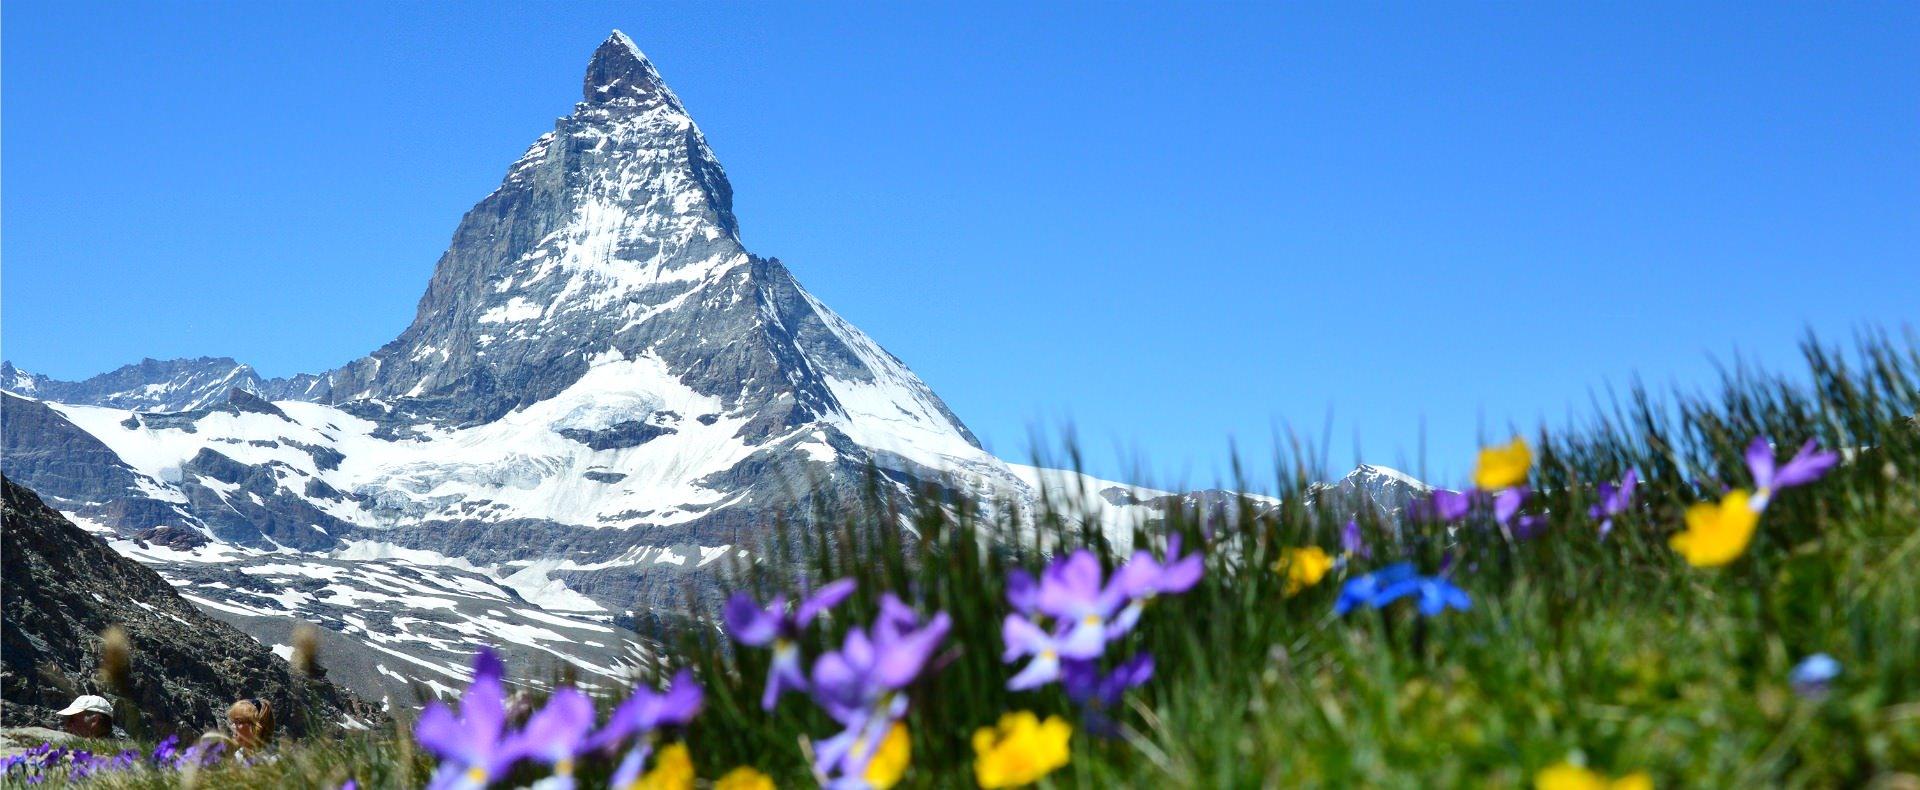 Zermatt Matterhorn, Switzerland